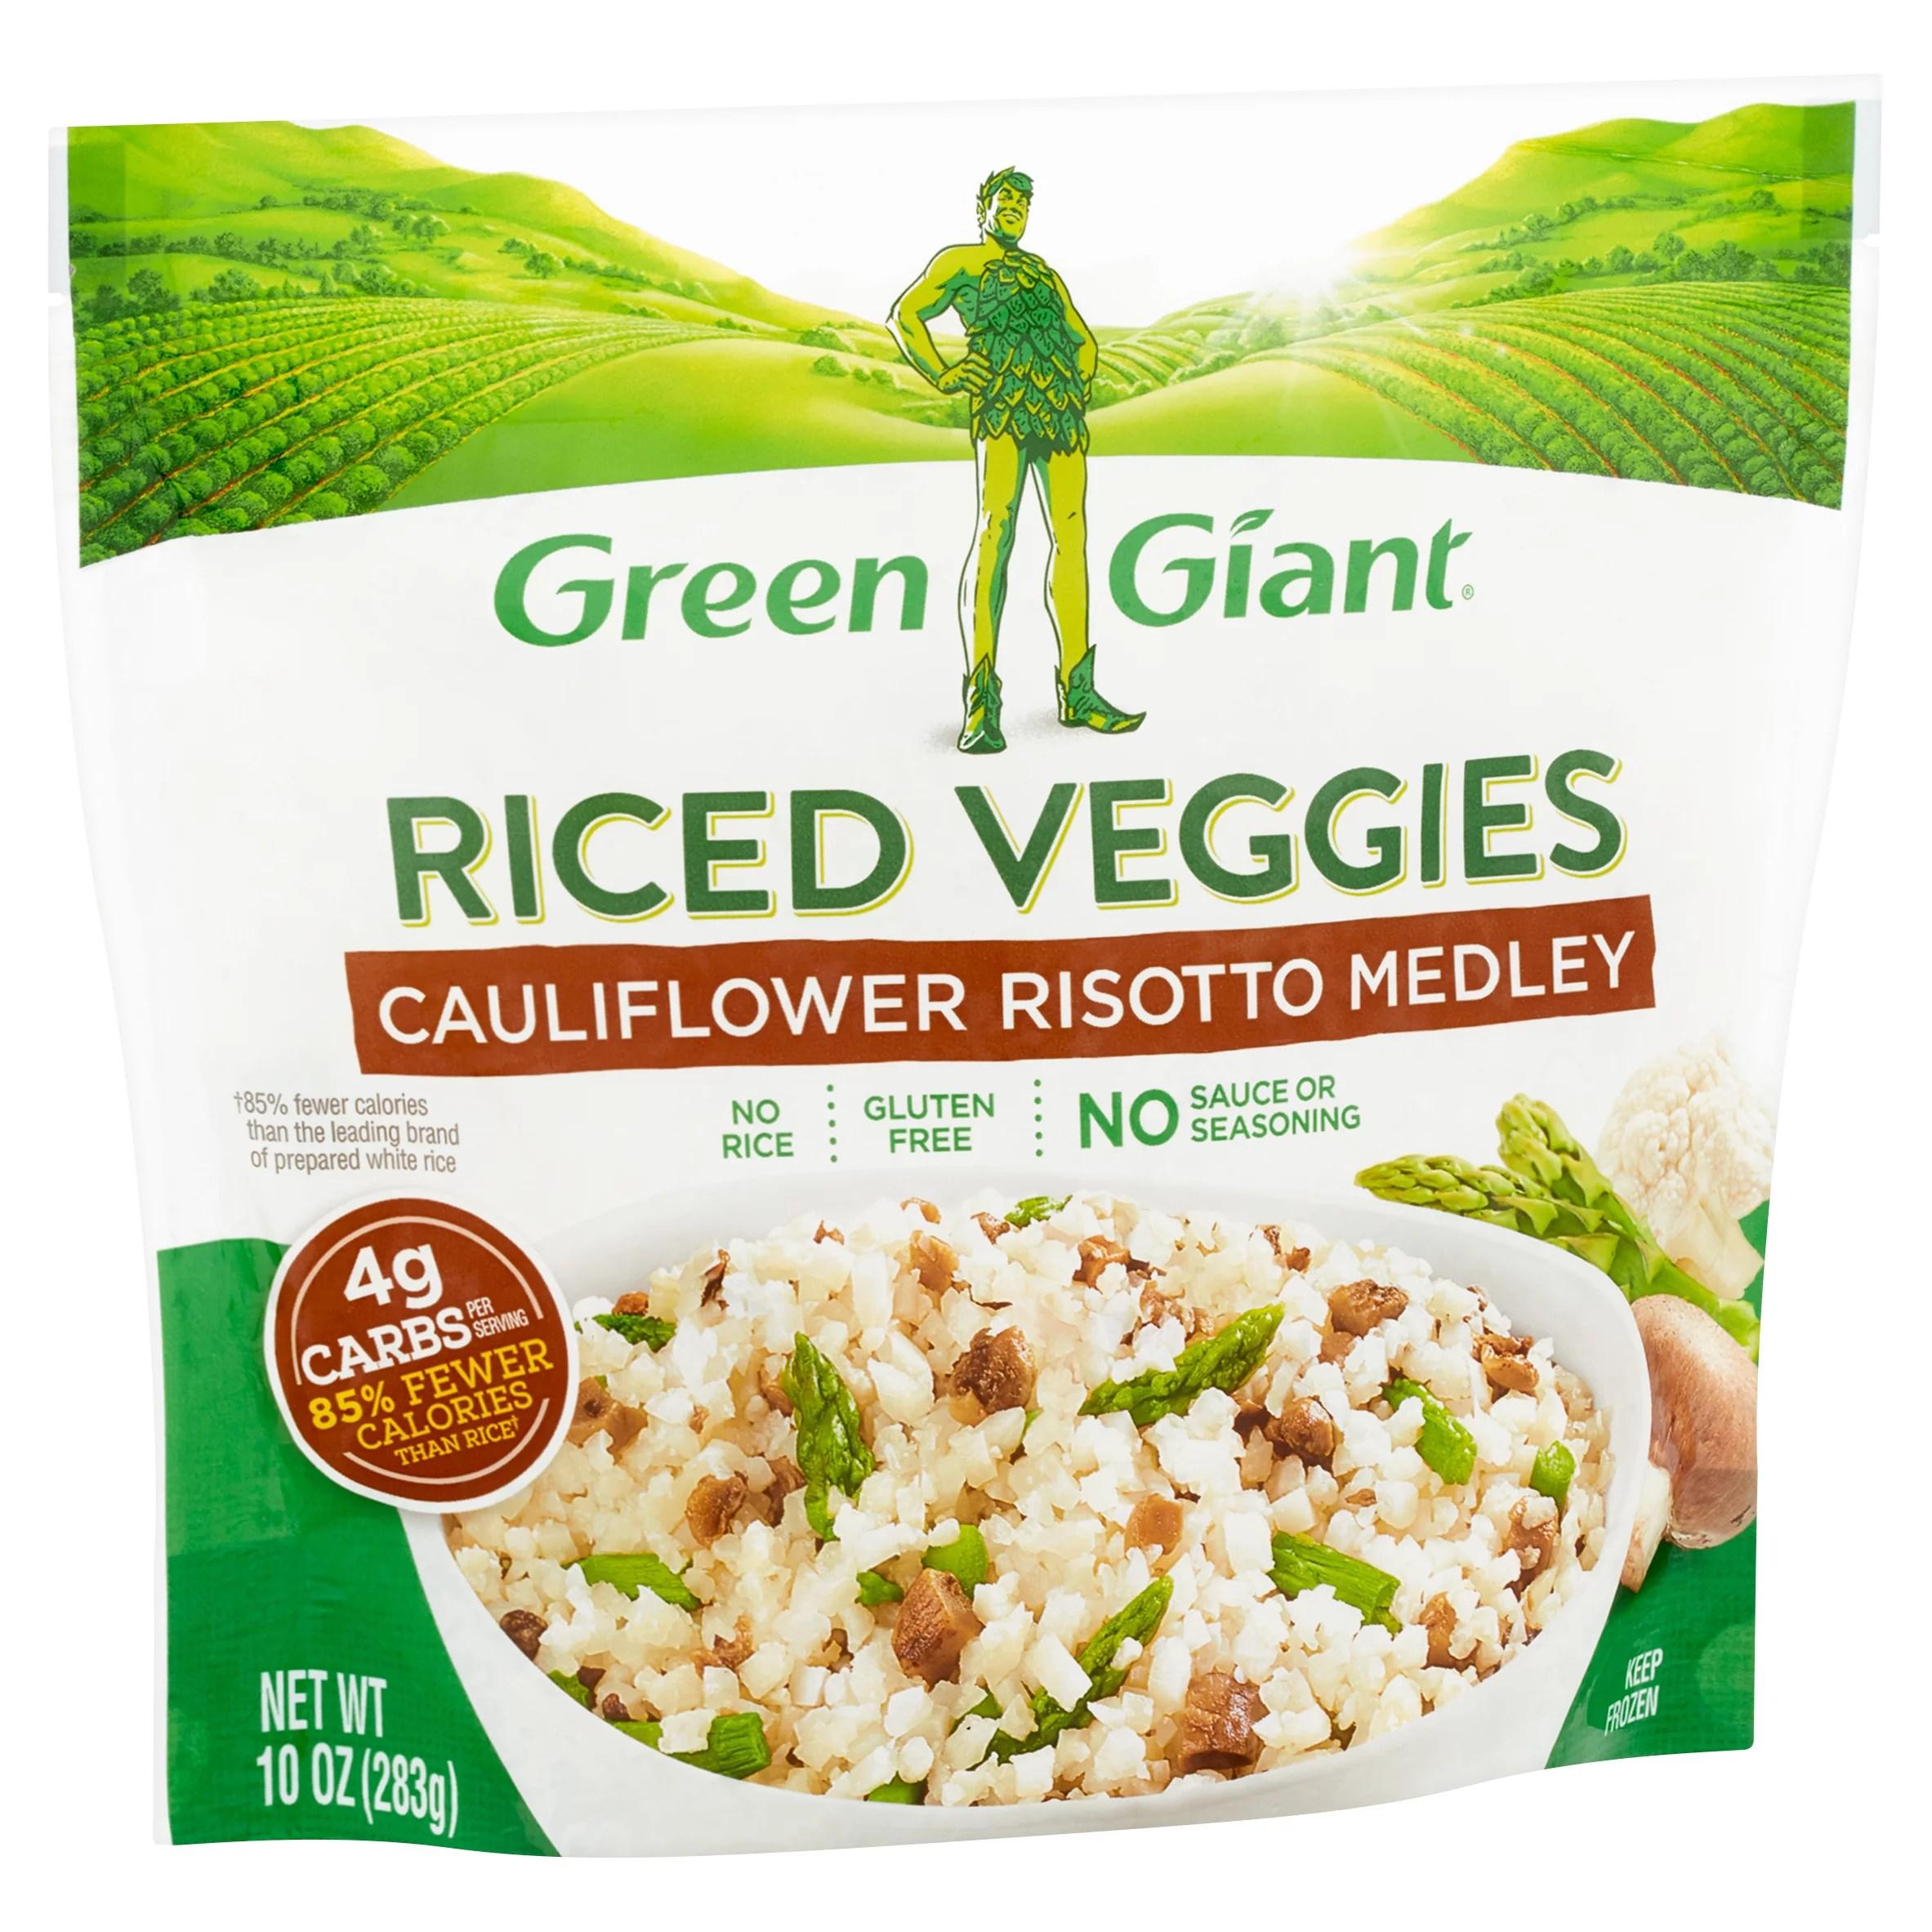 green giant cauliflower risotto medley riced veggies 10 oz walmart com